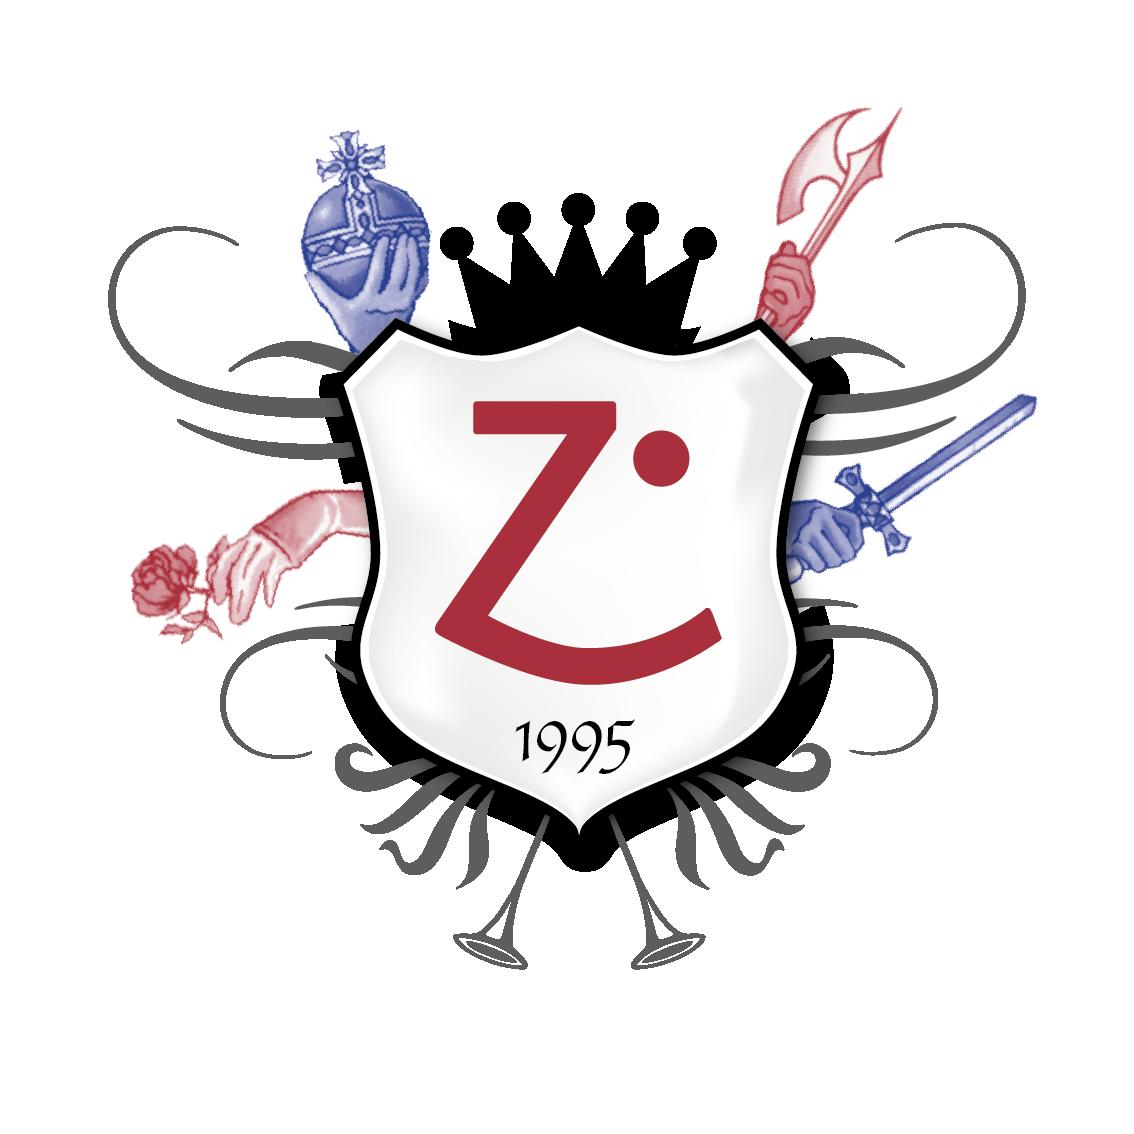 zappo-Wappen-2012-2-01